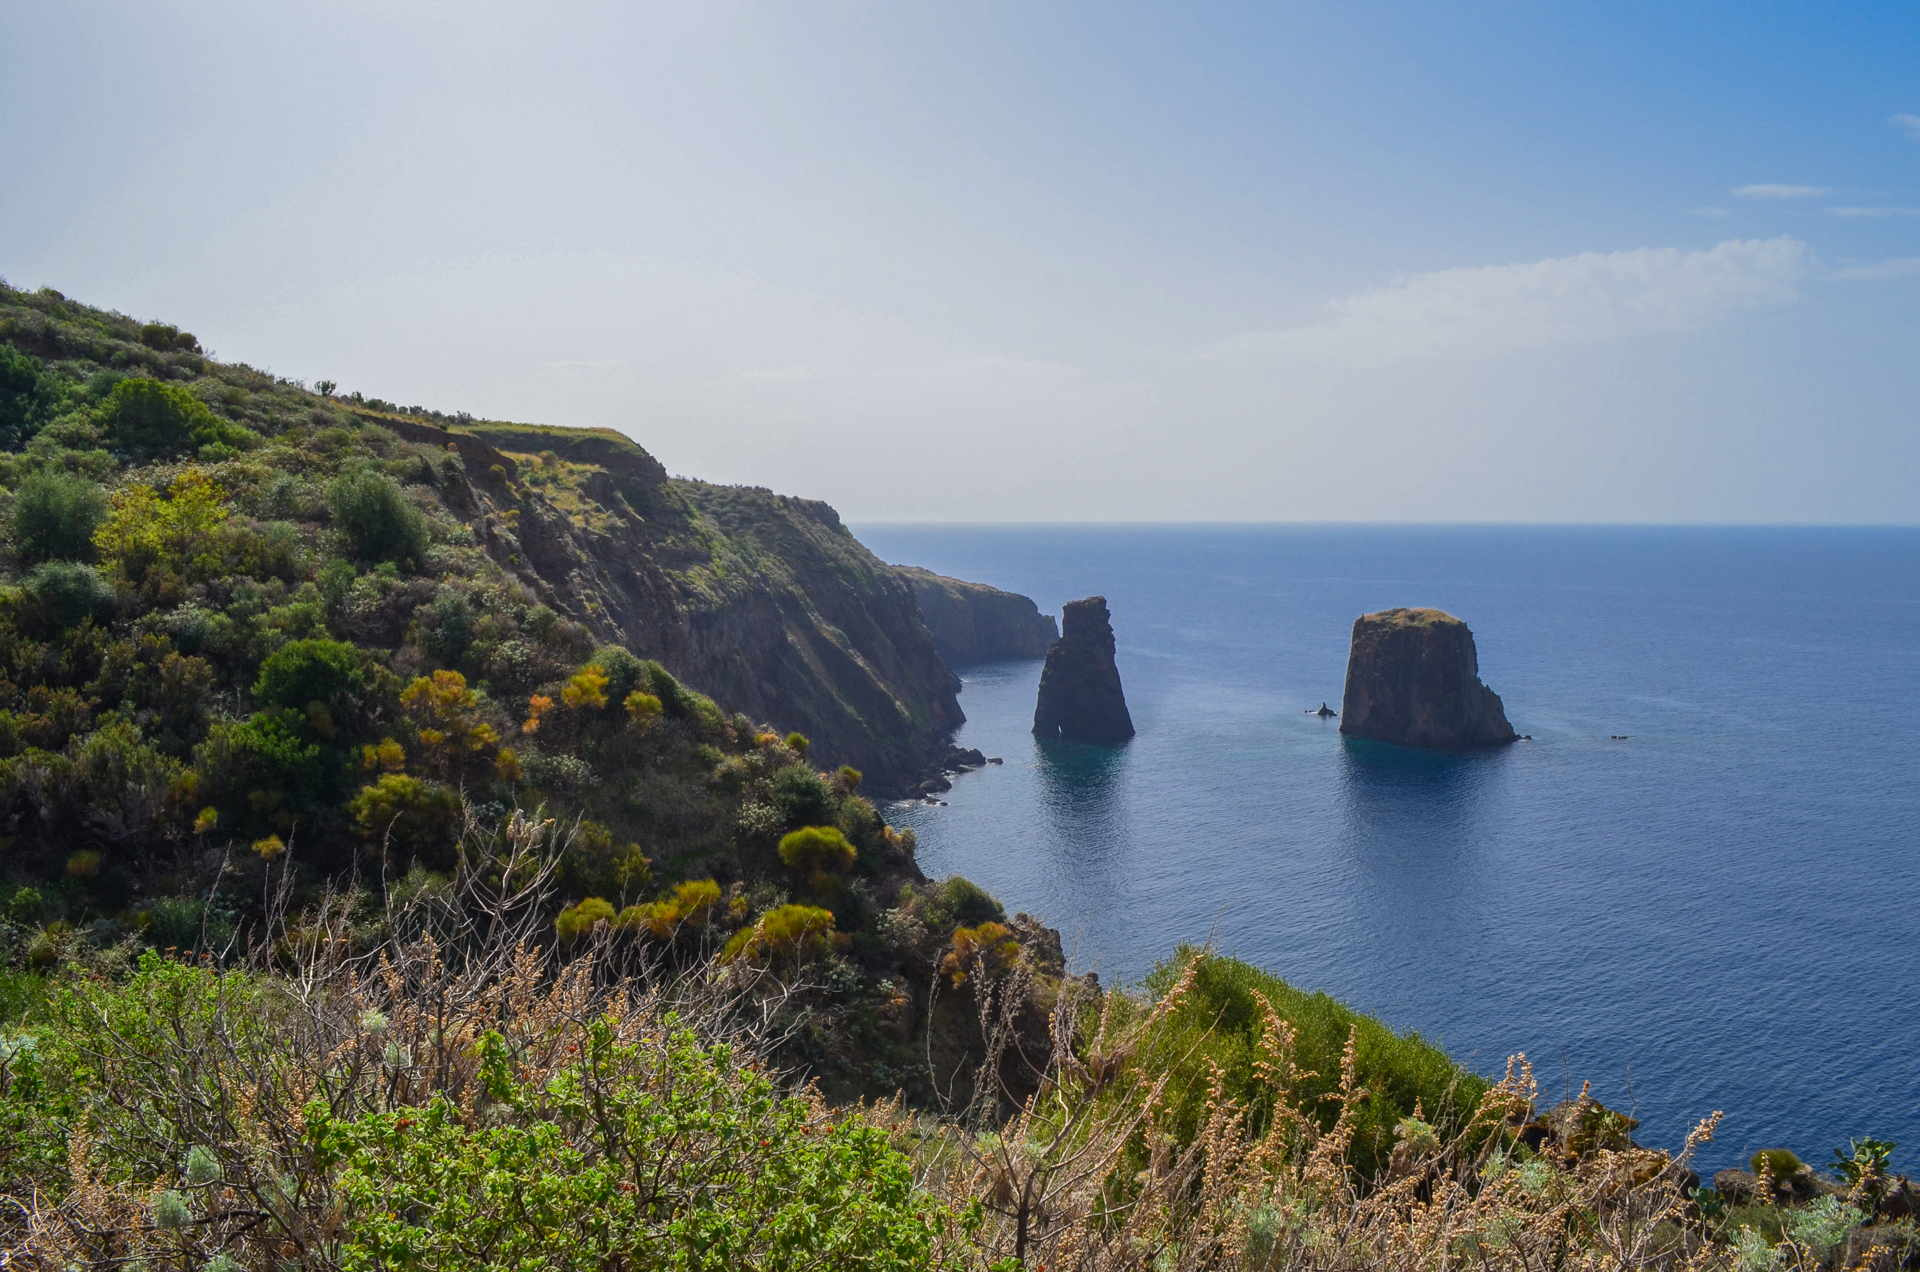 lipari travel, aeolian islands travel guide, travel blog lipari, aeolian islands travel, best places of aeolian islands, hiking lipari